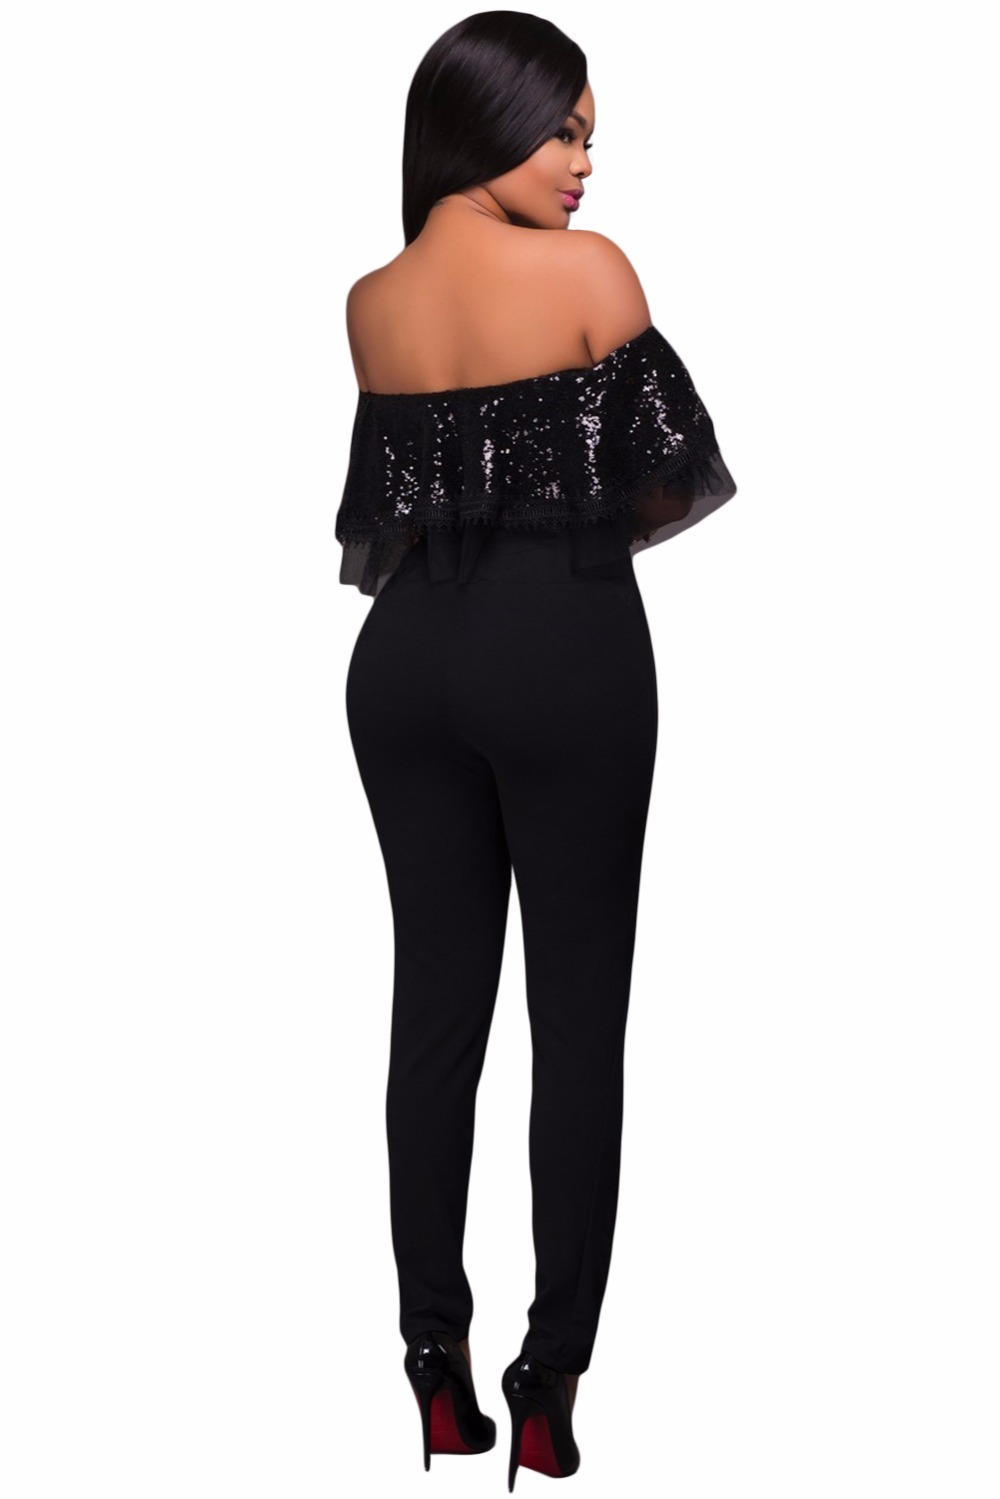 Black-Sequin-Ruffle-Top-Jumpsuit-LC64249-2-3